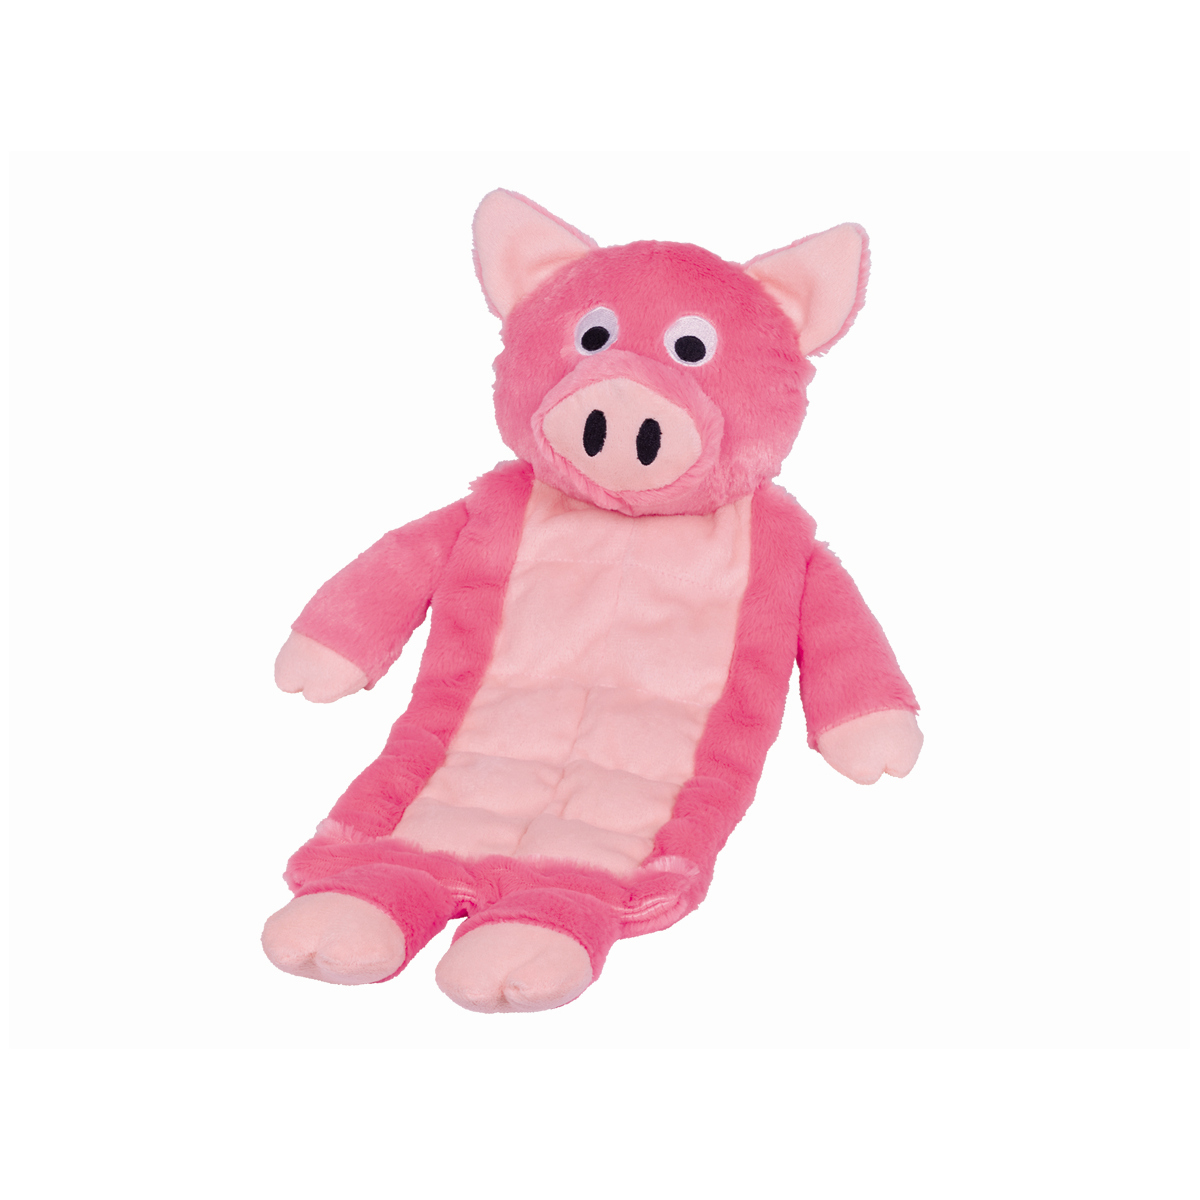 Pluche plat varken roze